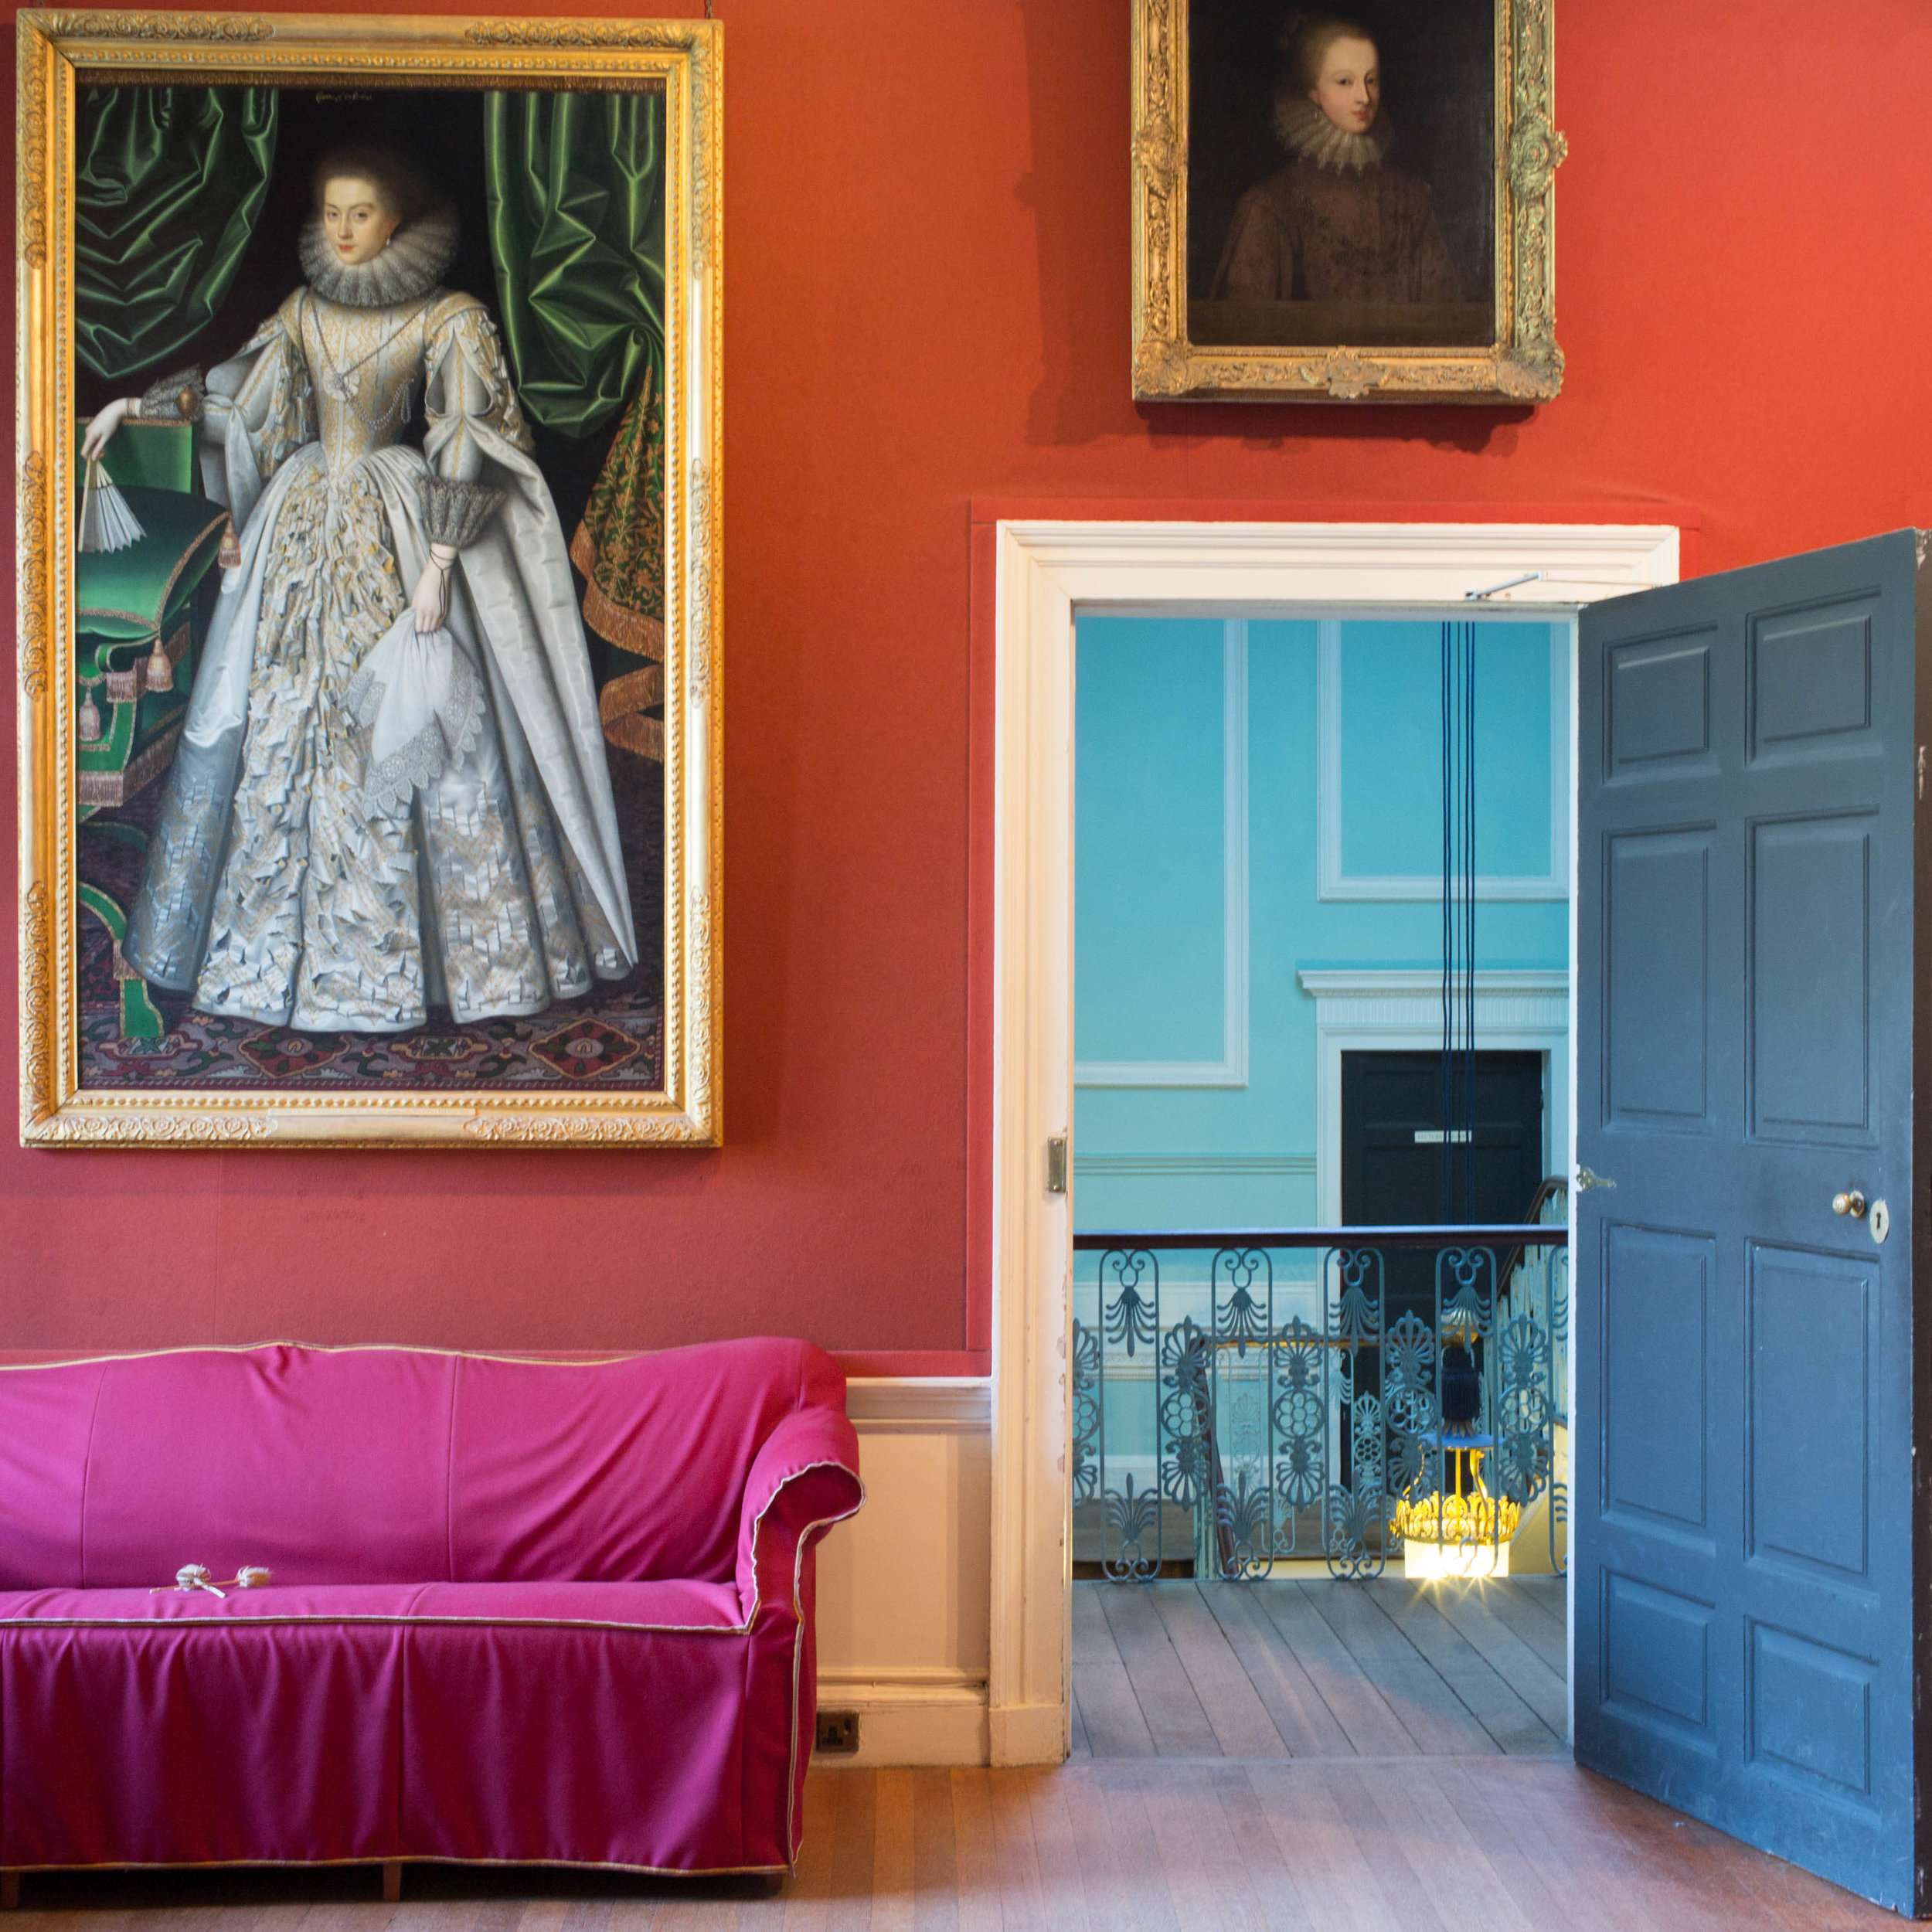 "Pink Sofa, 2016, archival inkjet print, 13.5"" x 13.5"" unframed"